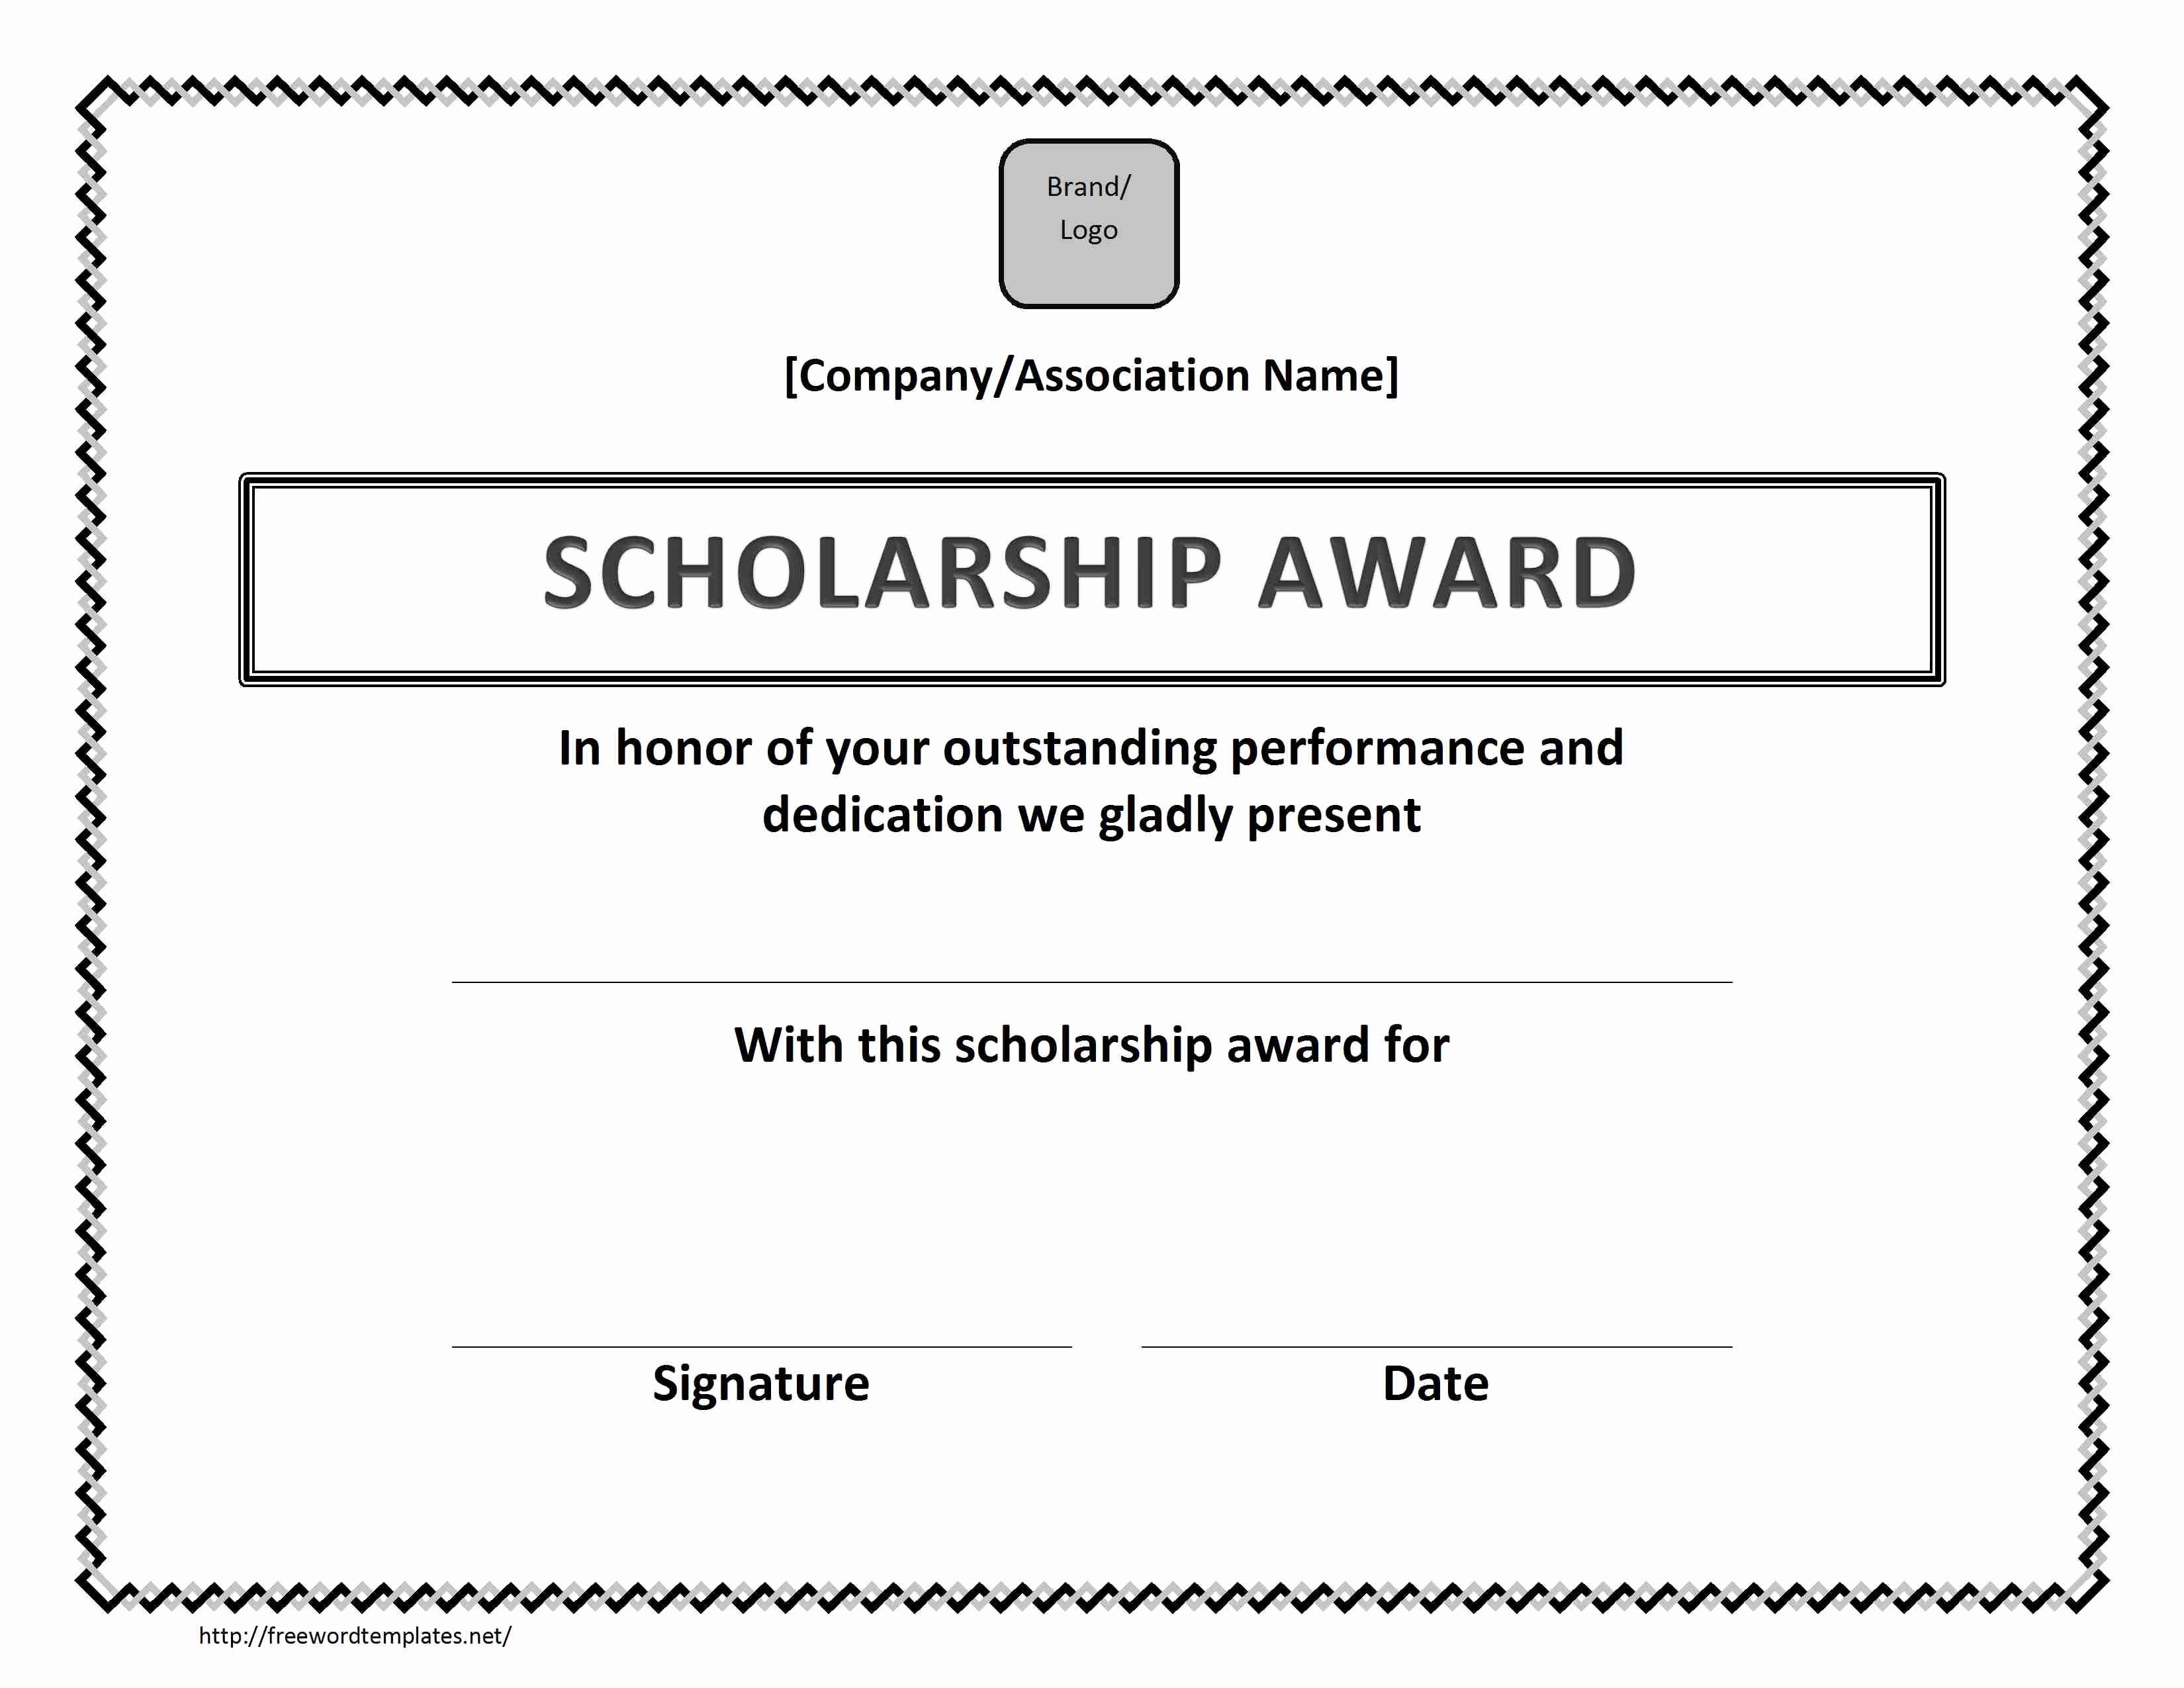 Scholarship Award Certificate Template Free Beautiful Scholarship Award Certificate